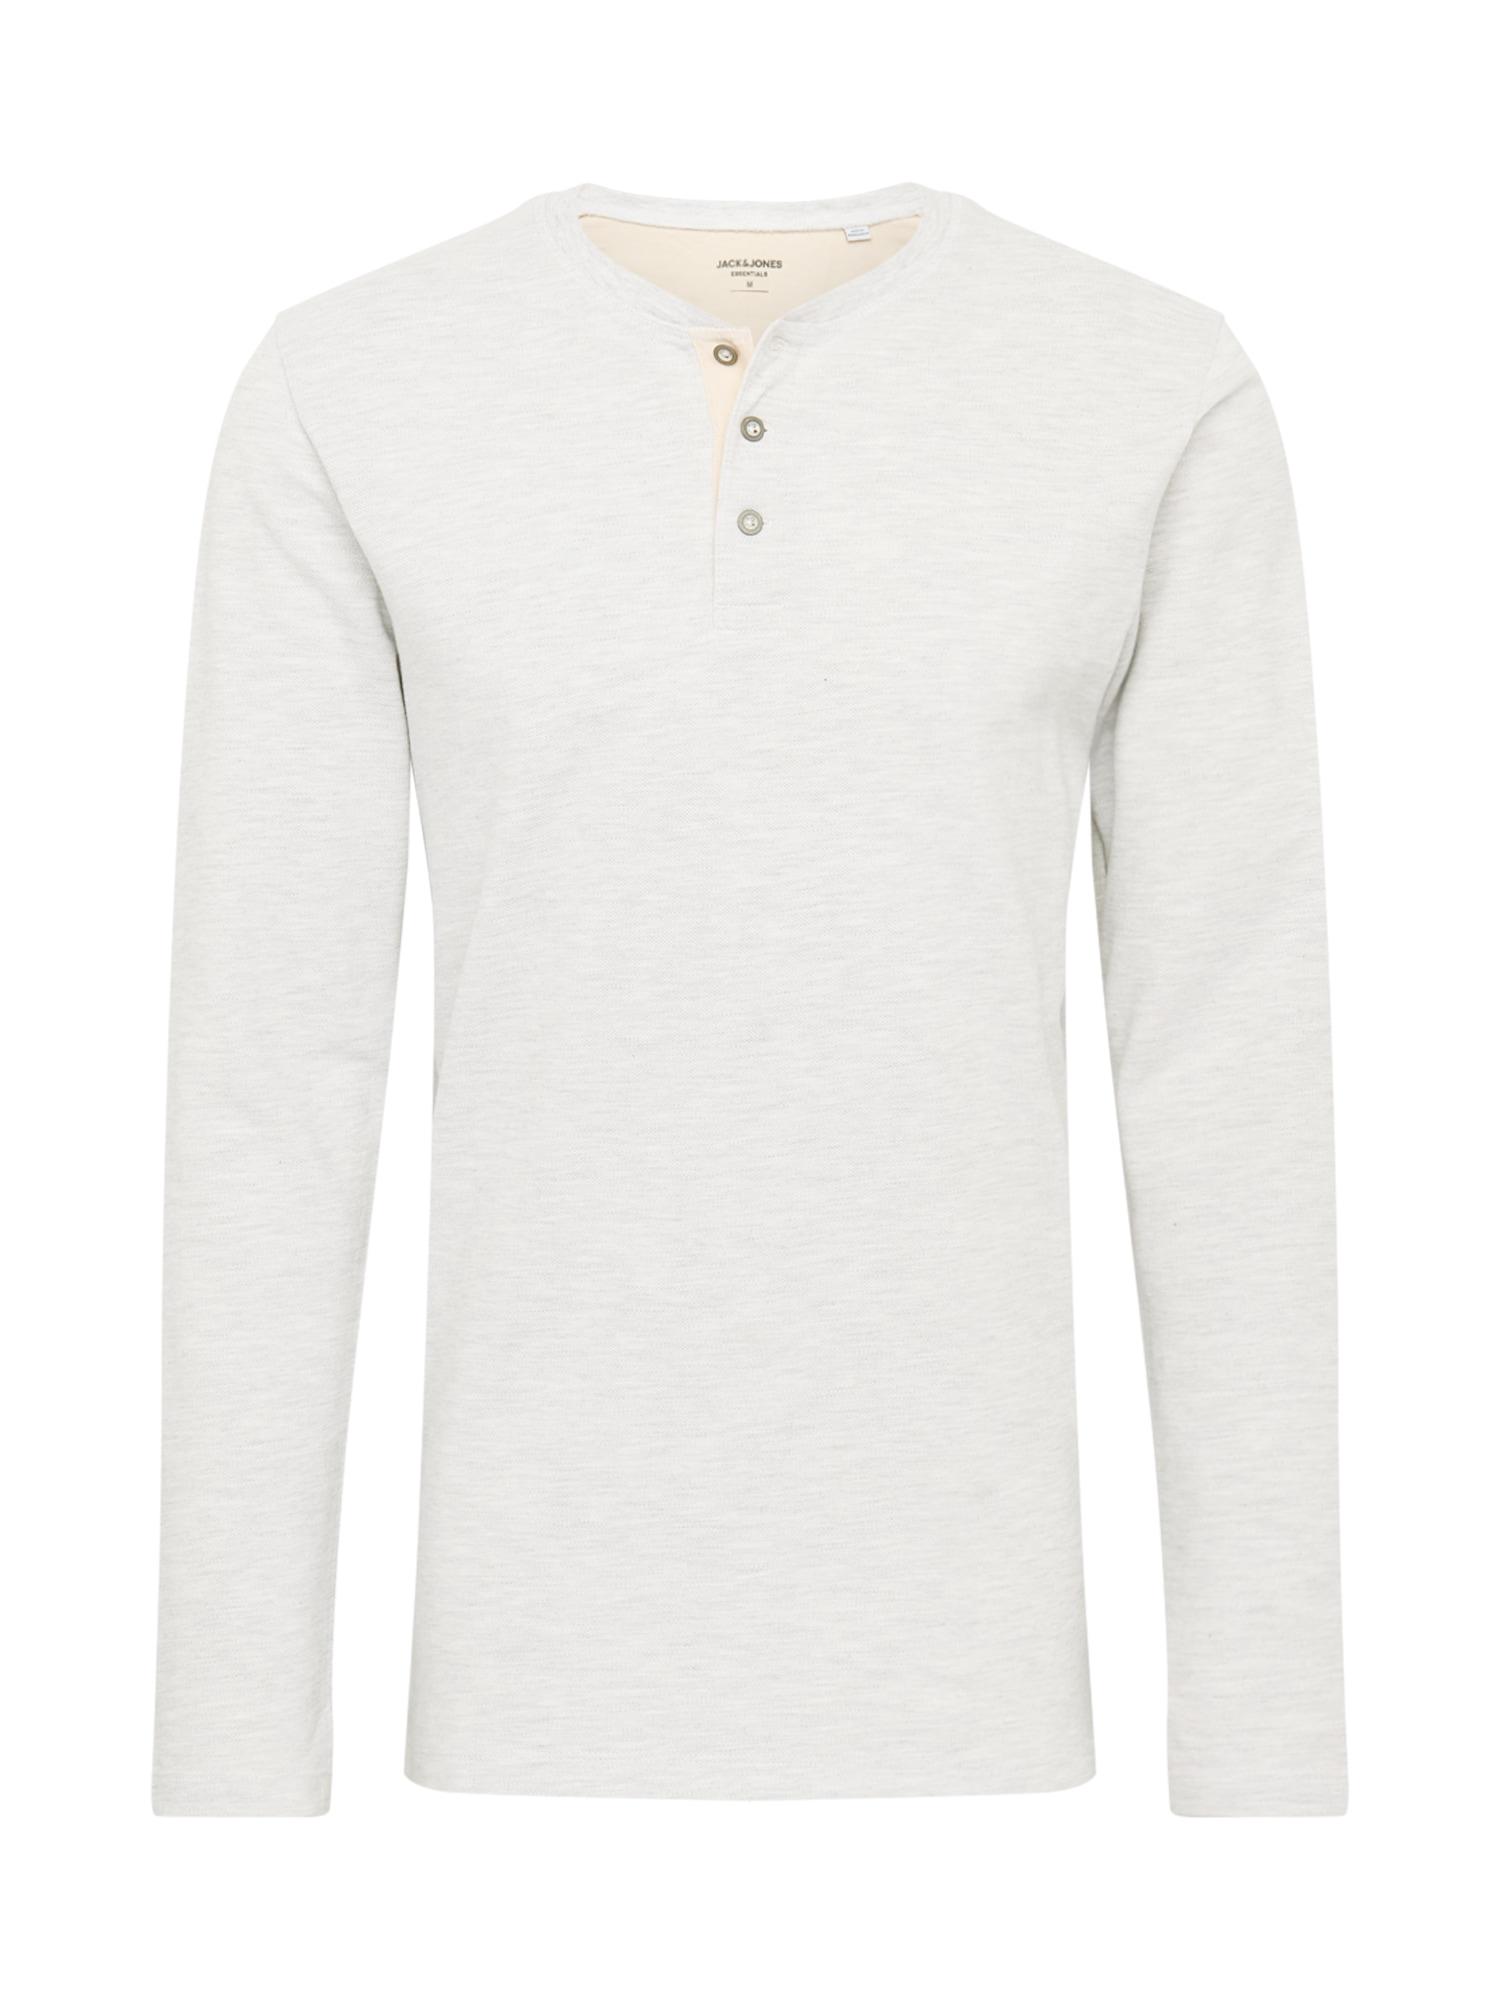 JACK & JONES Marškinėliai natūrali balta